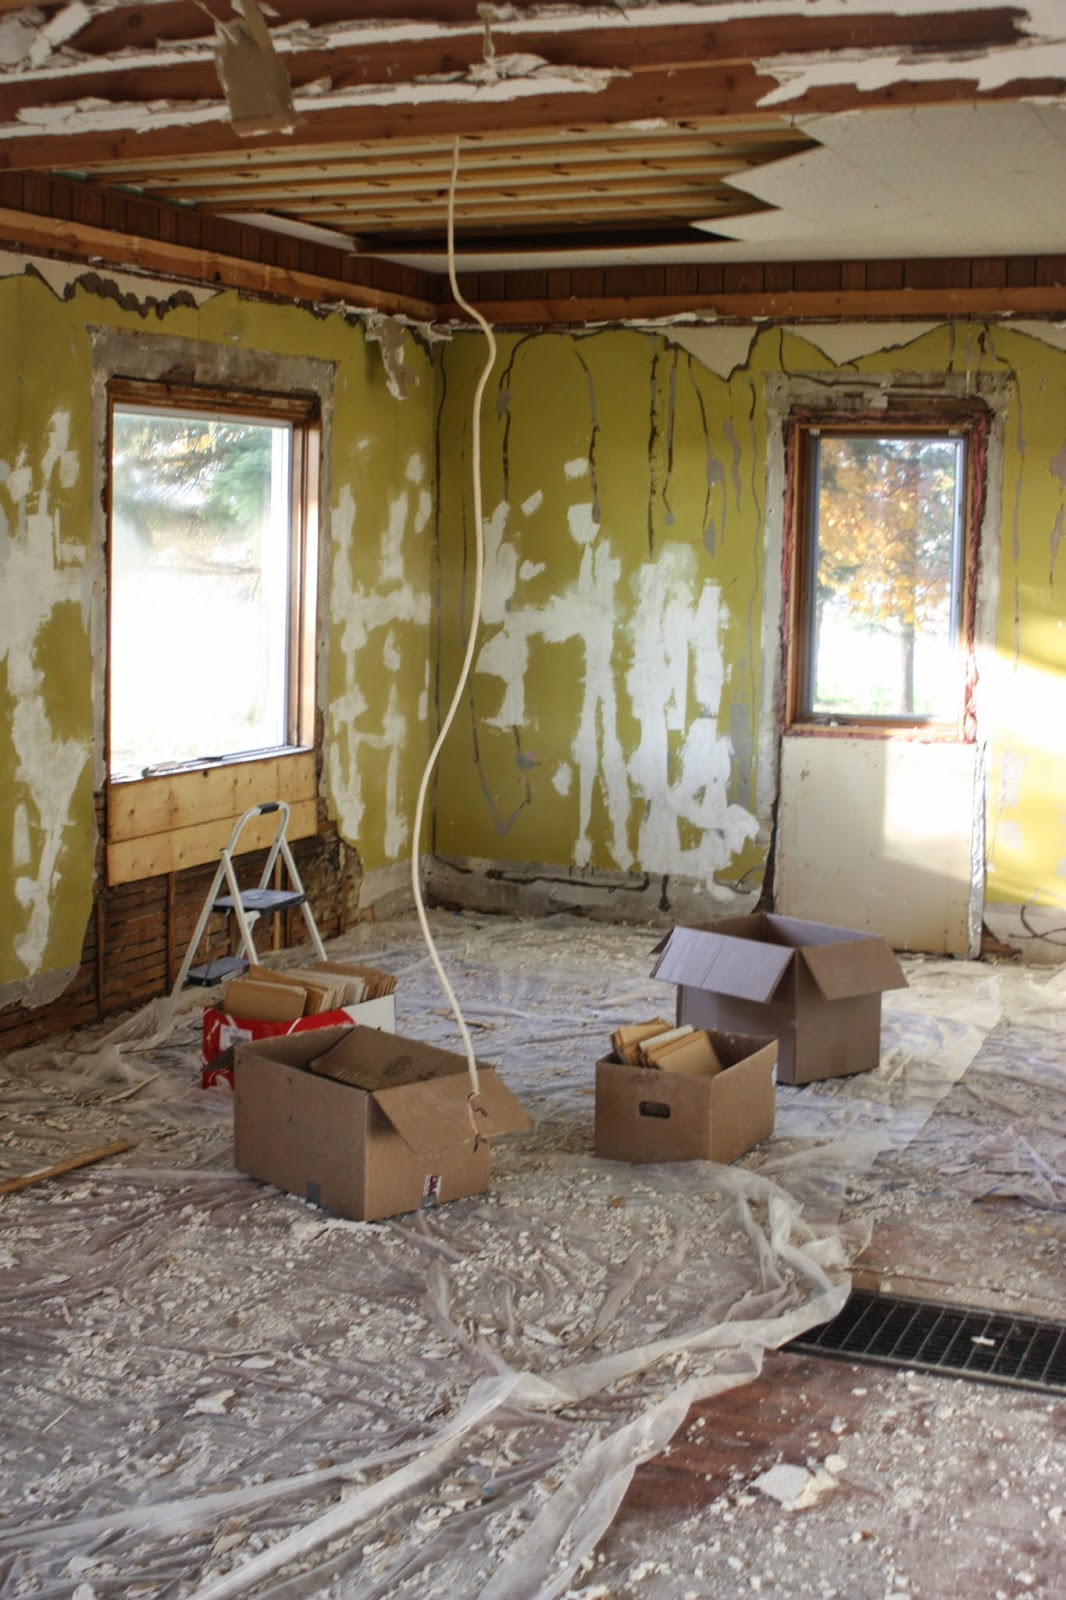 Demolition Phase Iii We Struck Gold The Popcorn Ceilings Get